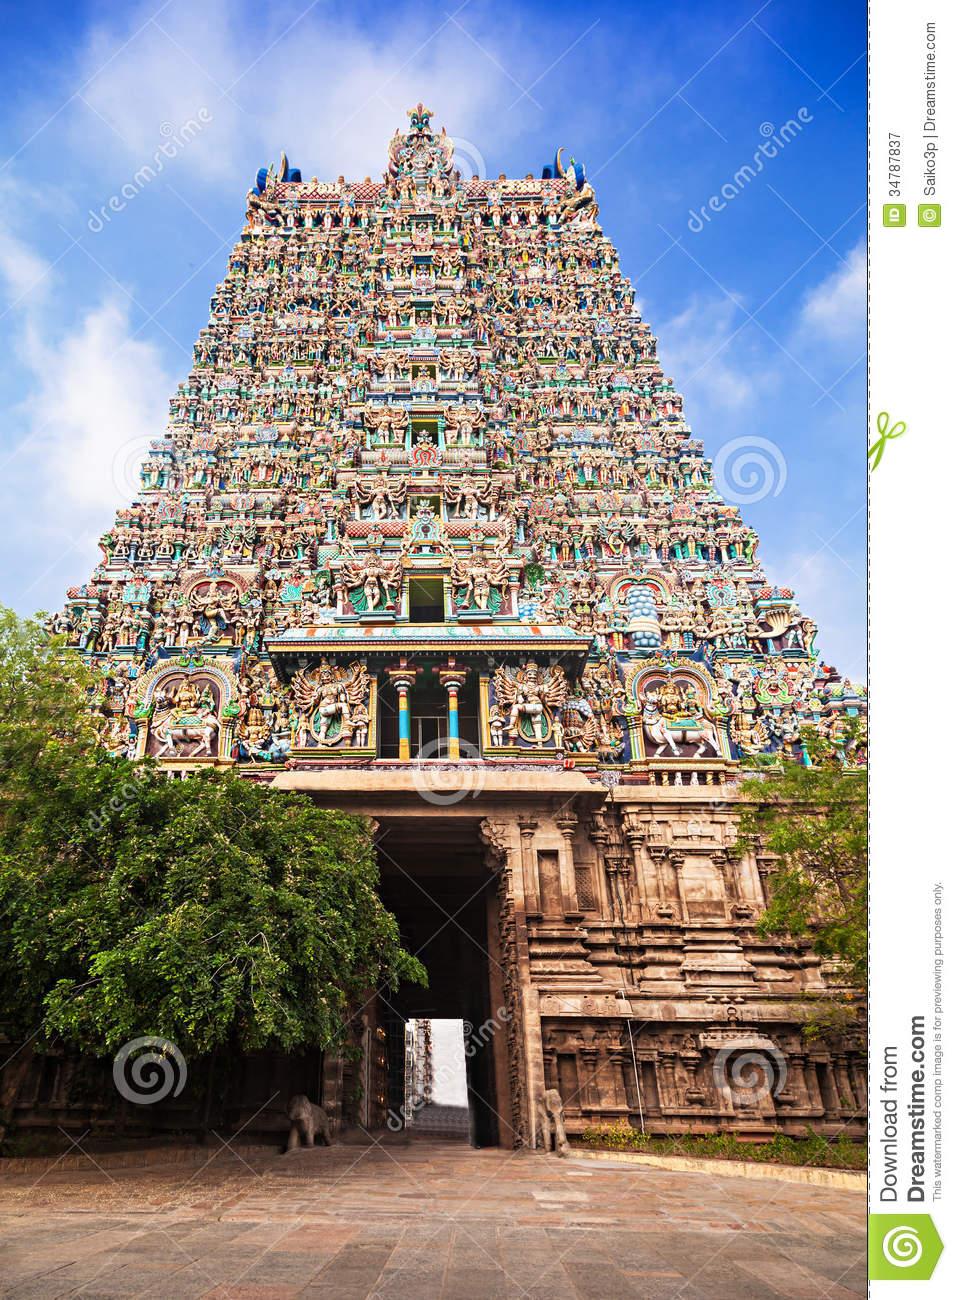 Madurai Meenakshi Temple Hd Clipart.